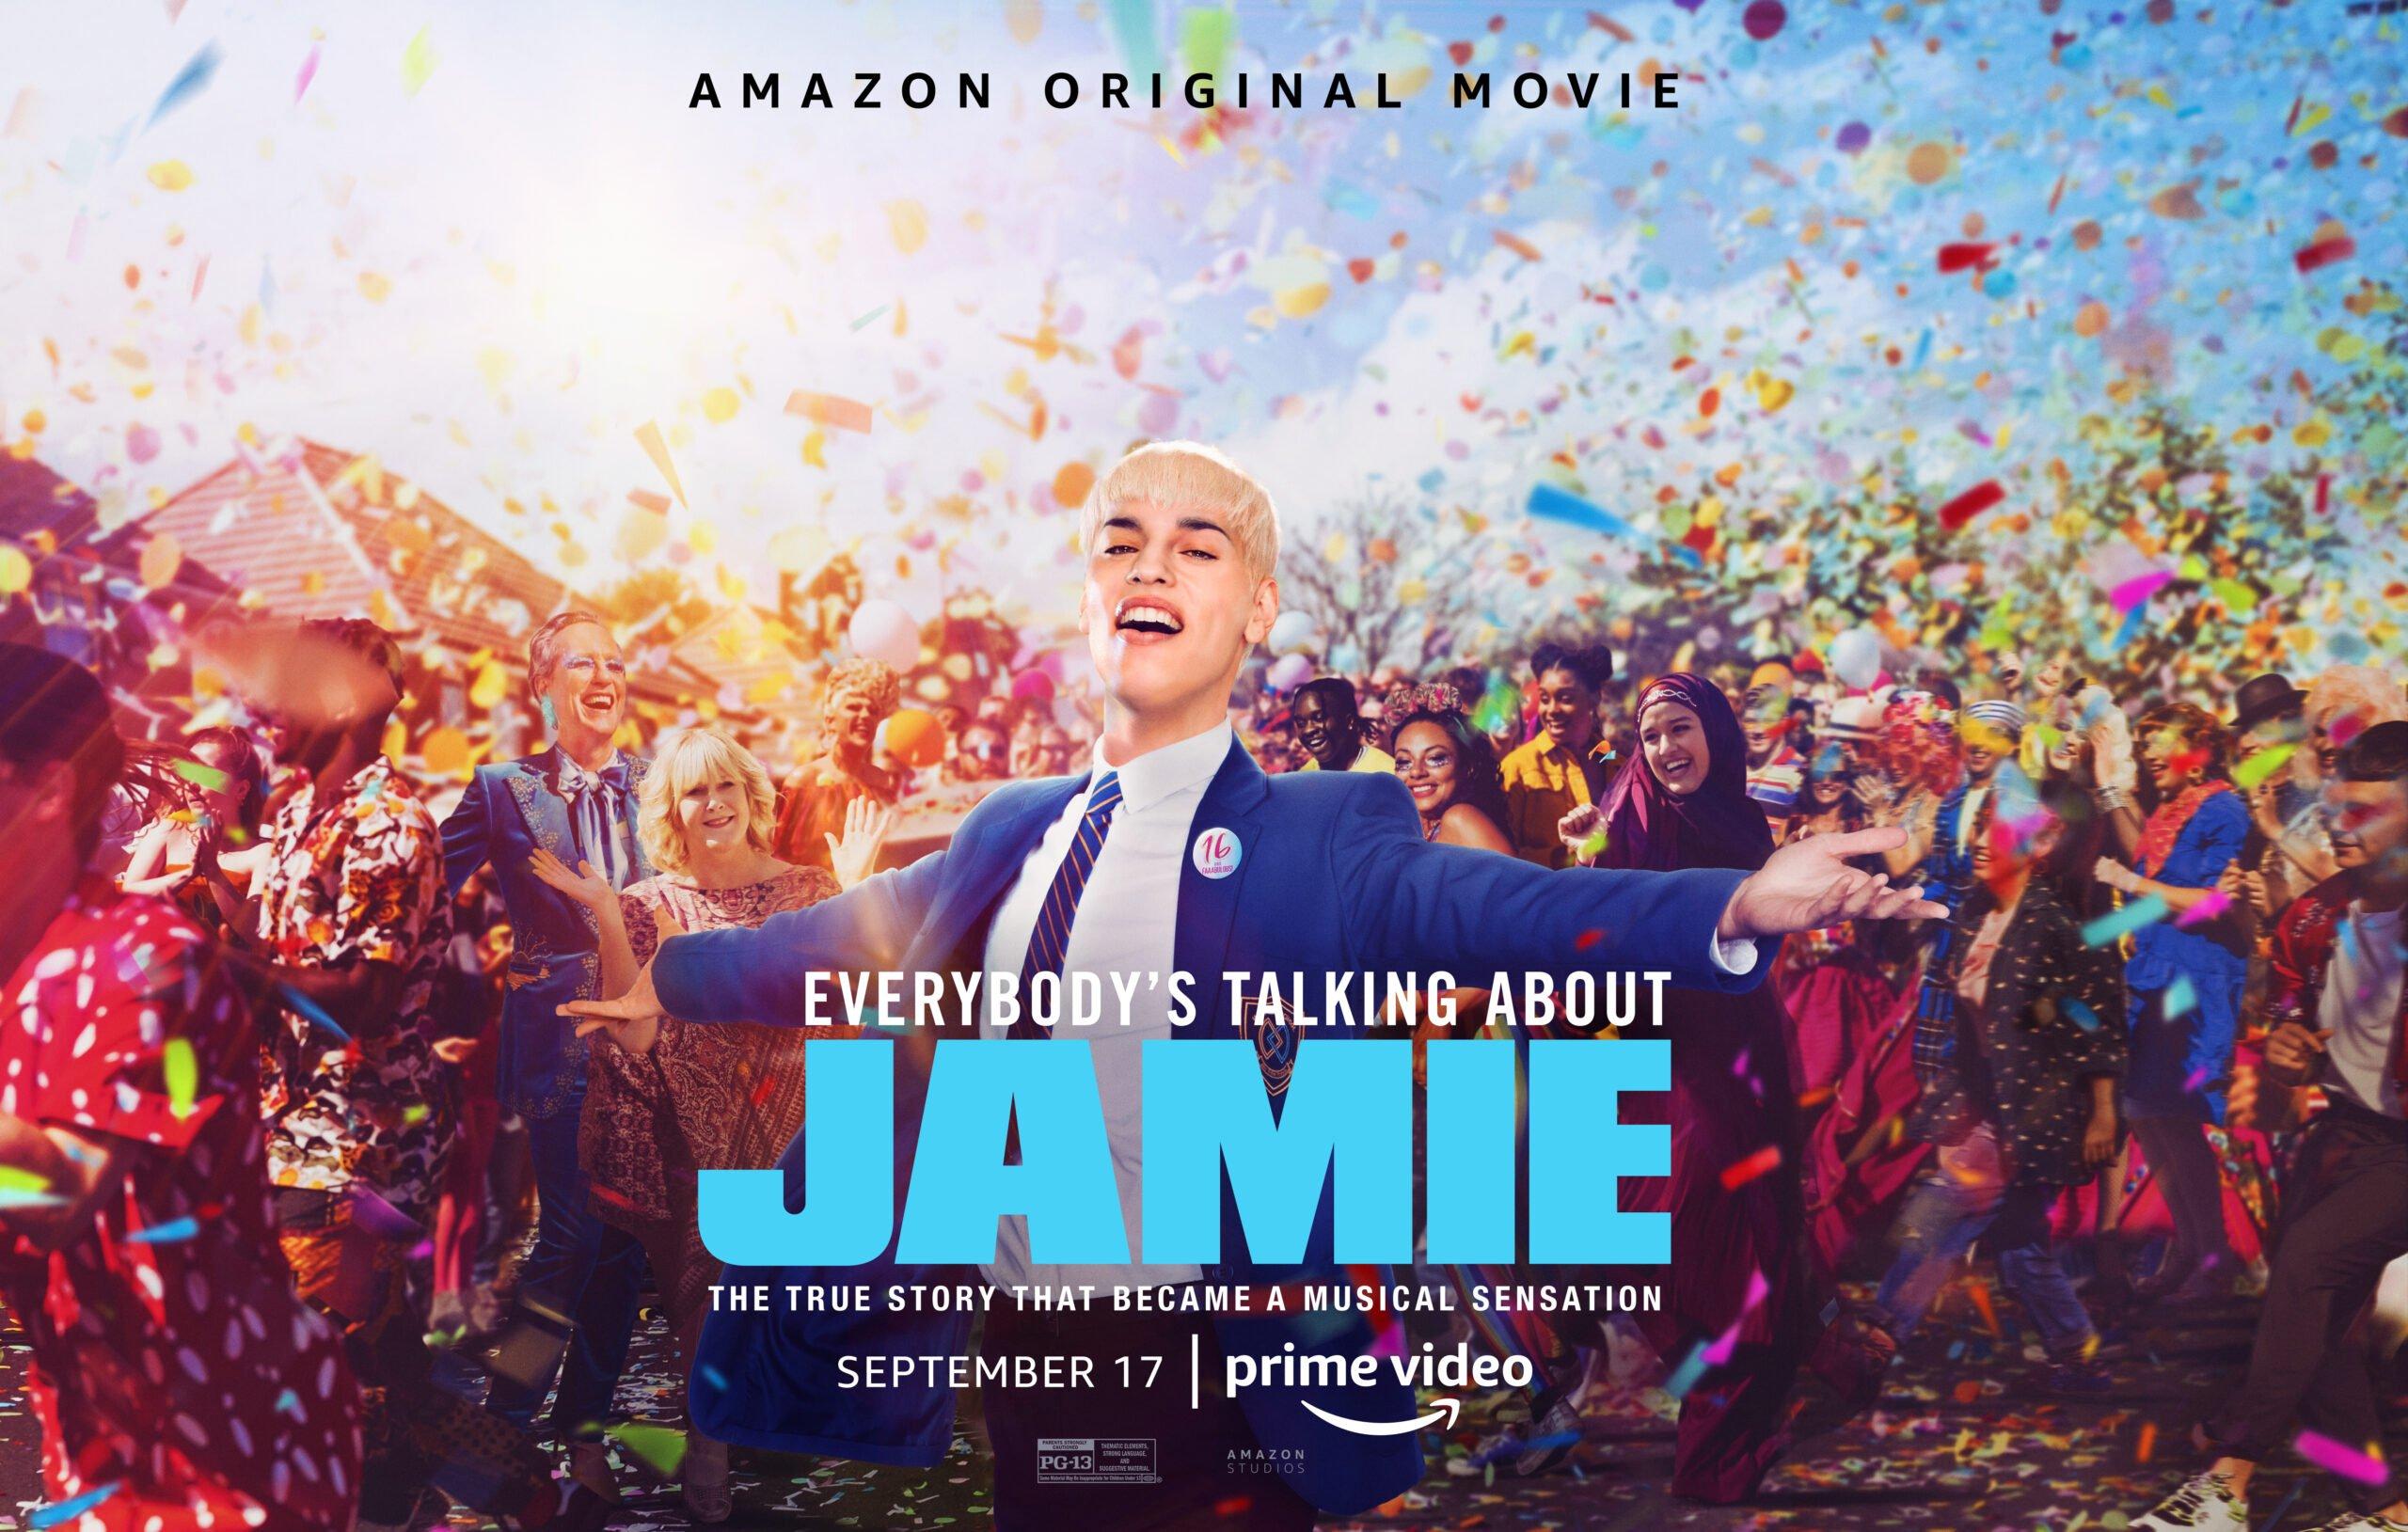 Everybody's Talking About Jamie Amazon